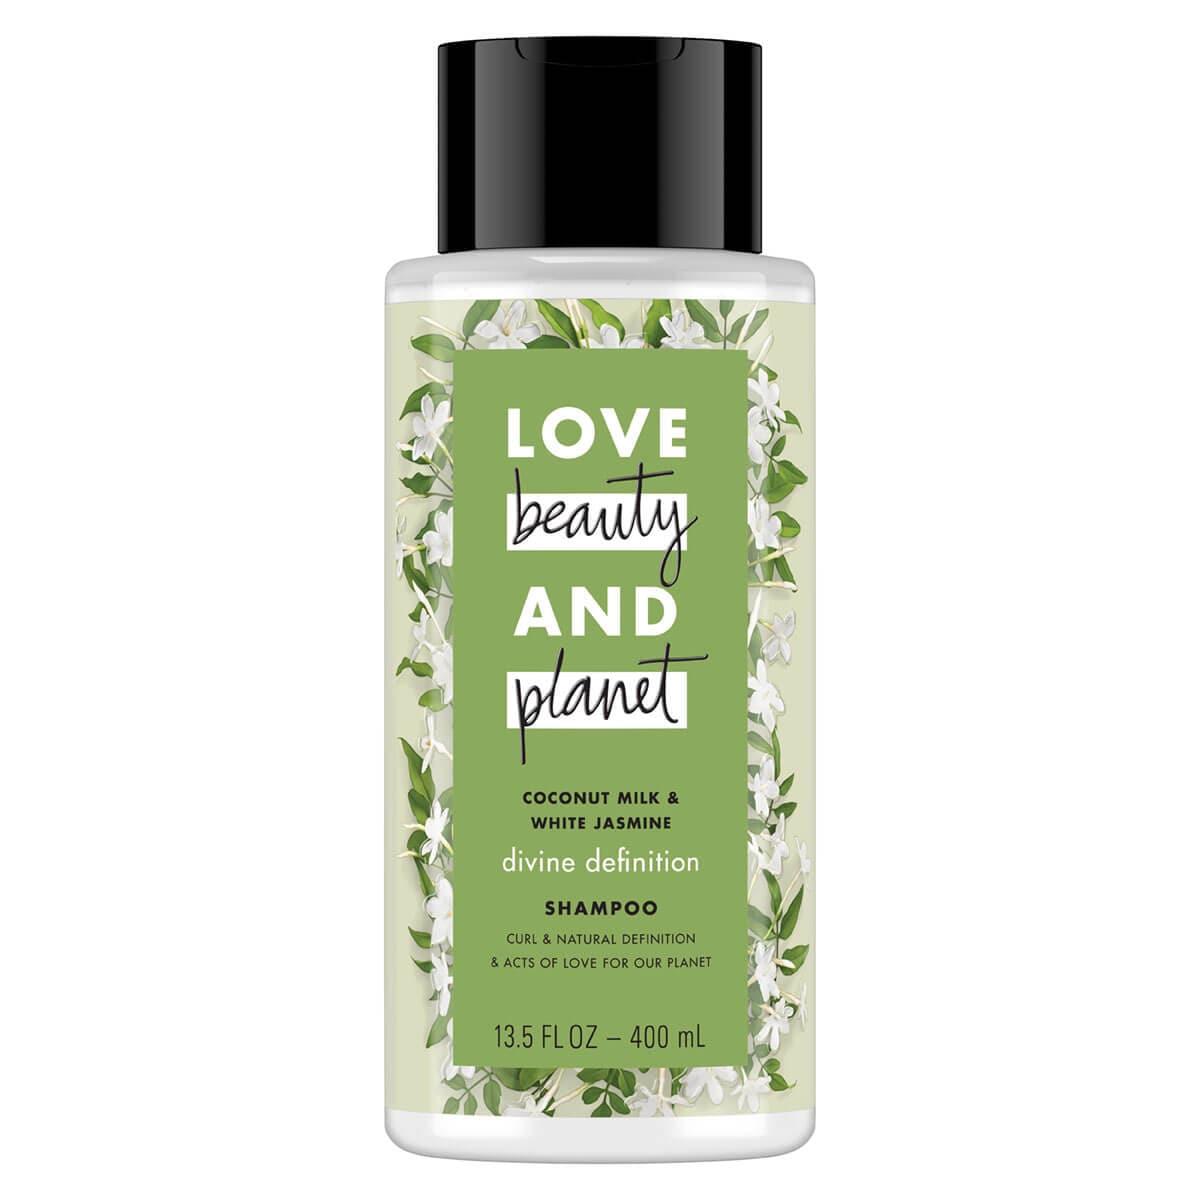 LOVE, BEAUTY and PLANET COCONUT MILK & WHITE JASMINE SHAMPOO